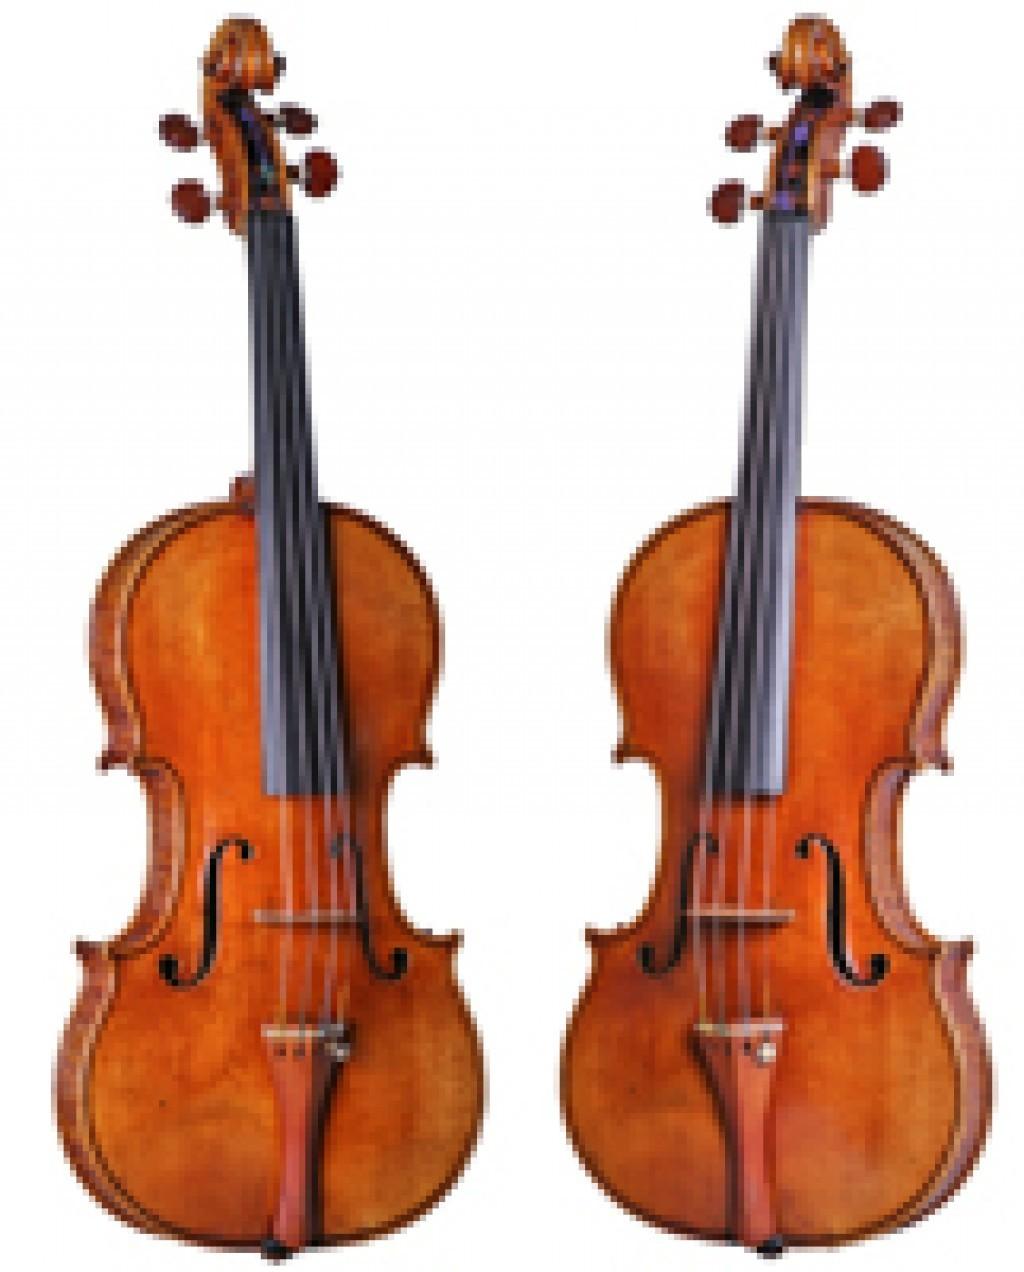 Betts violin, by Antonio Stradivari, Cremona, 1704. (Michael Zirkle/Courtesy Music Division, Library of Congress)